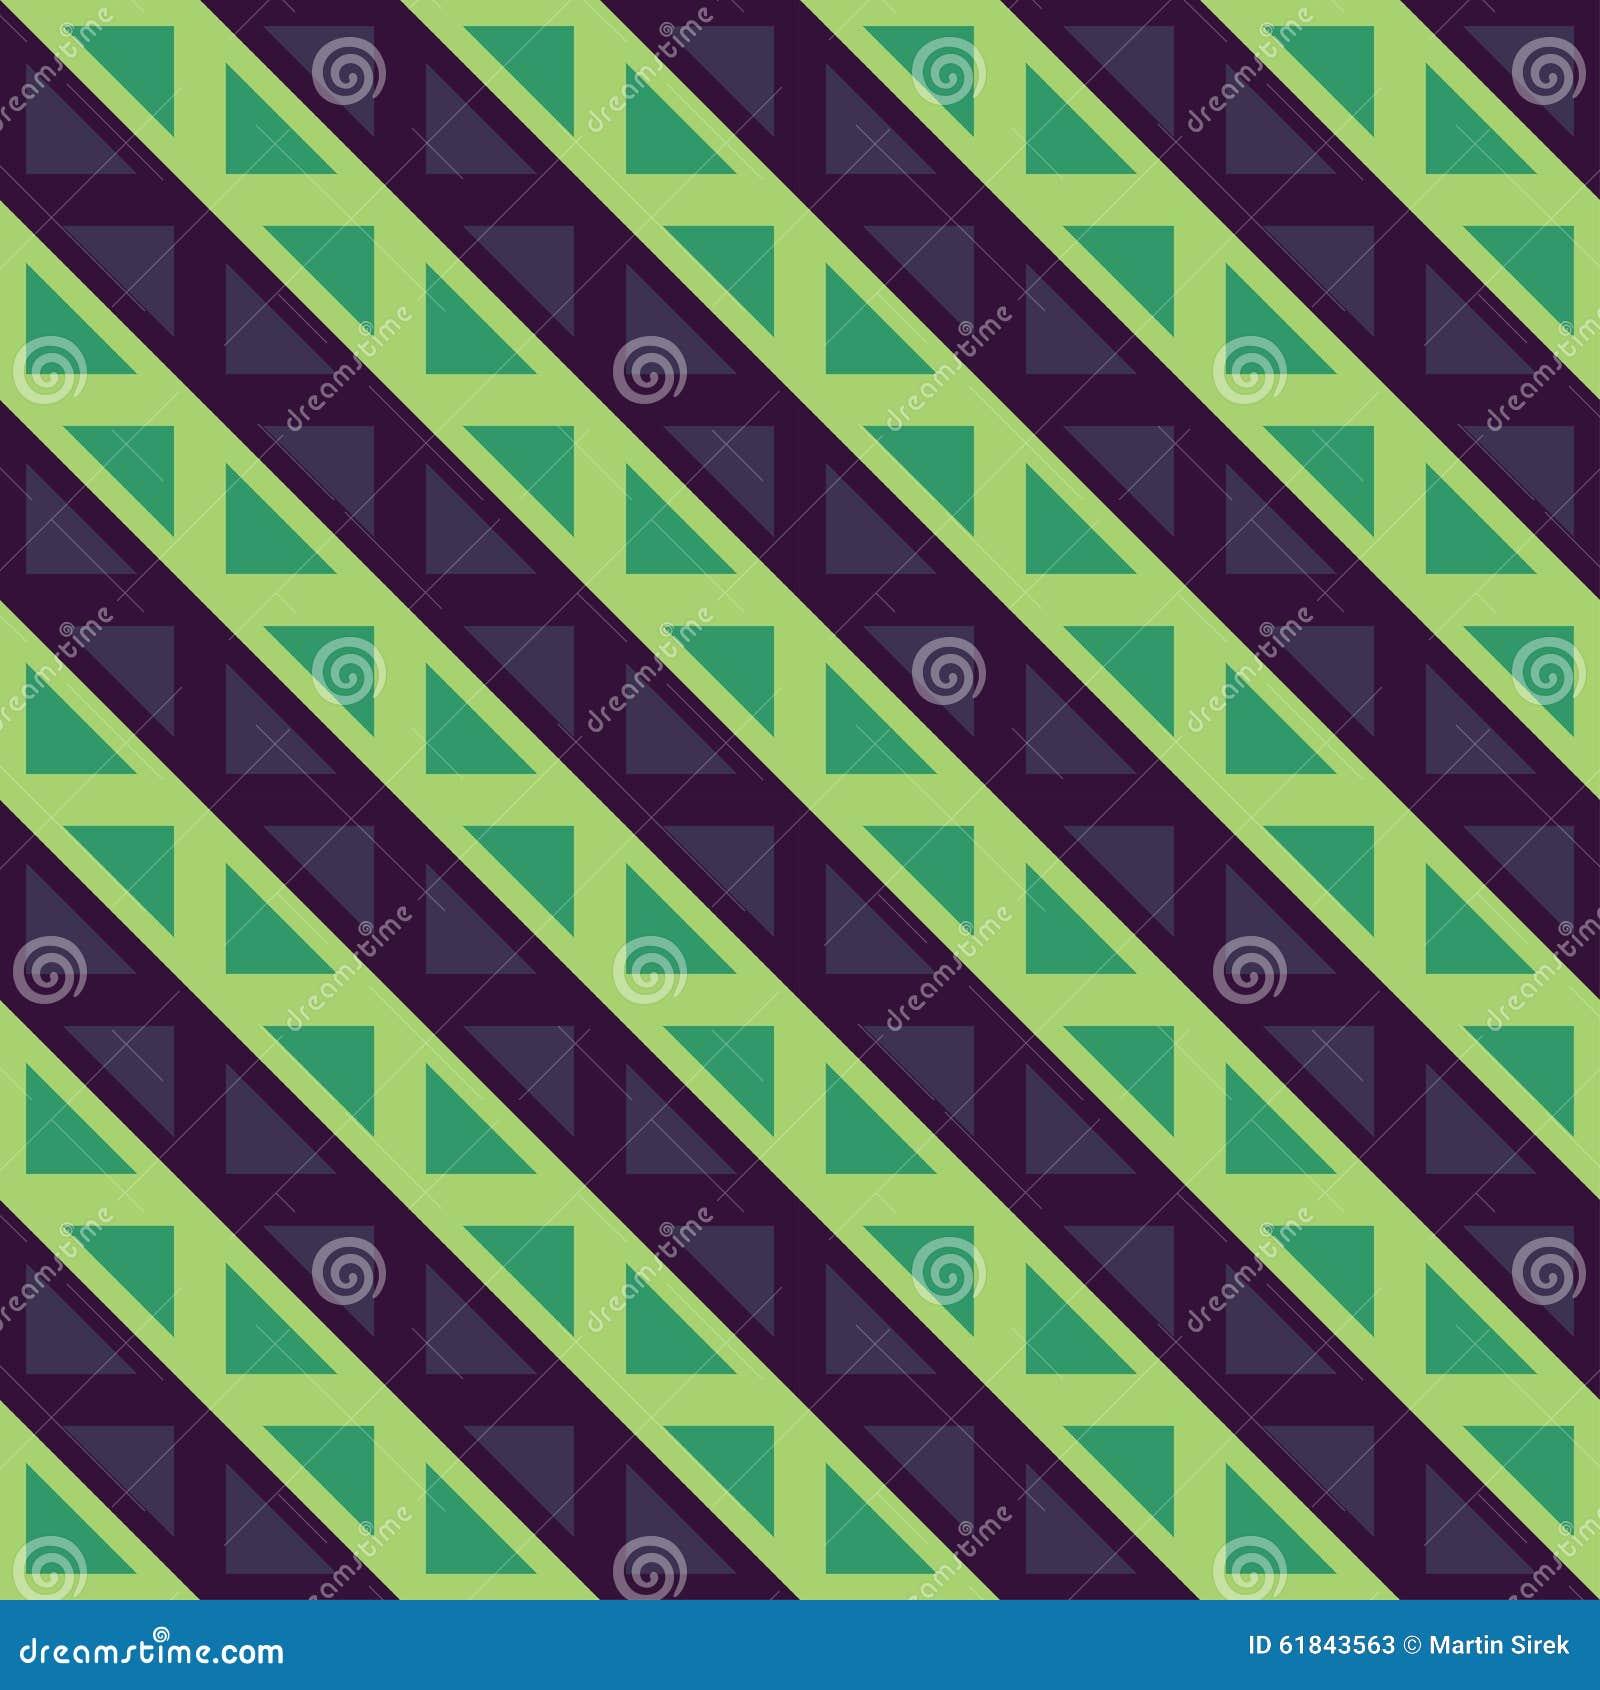 Blue Green Retro Abstract Vector Illustration